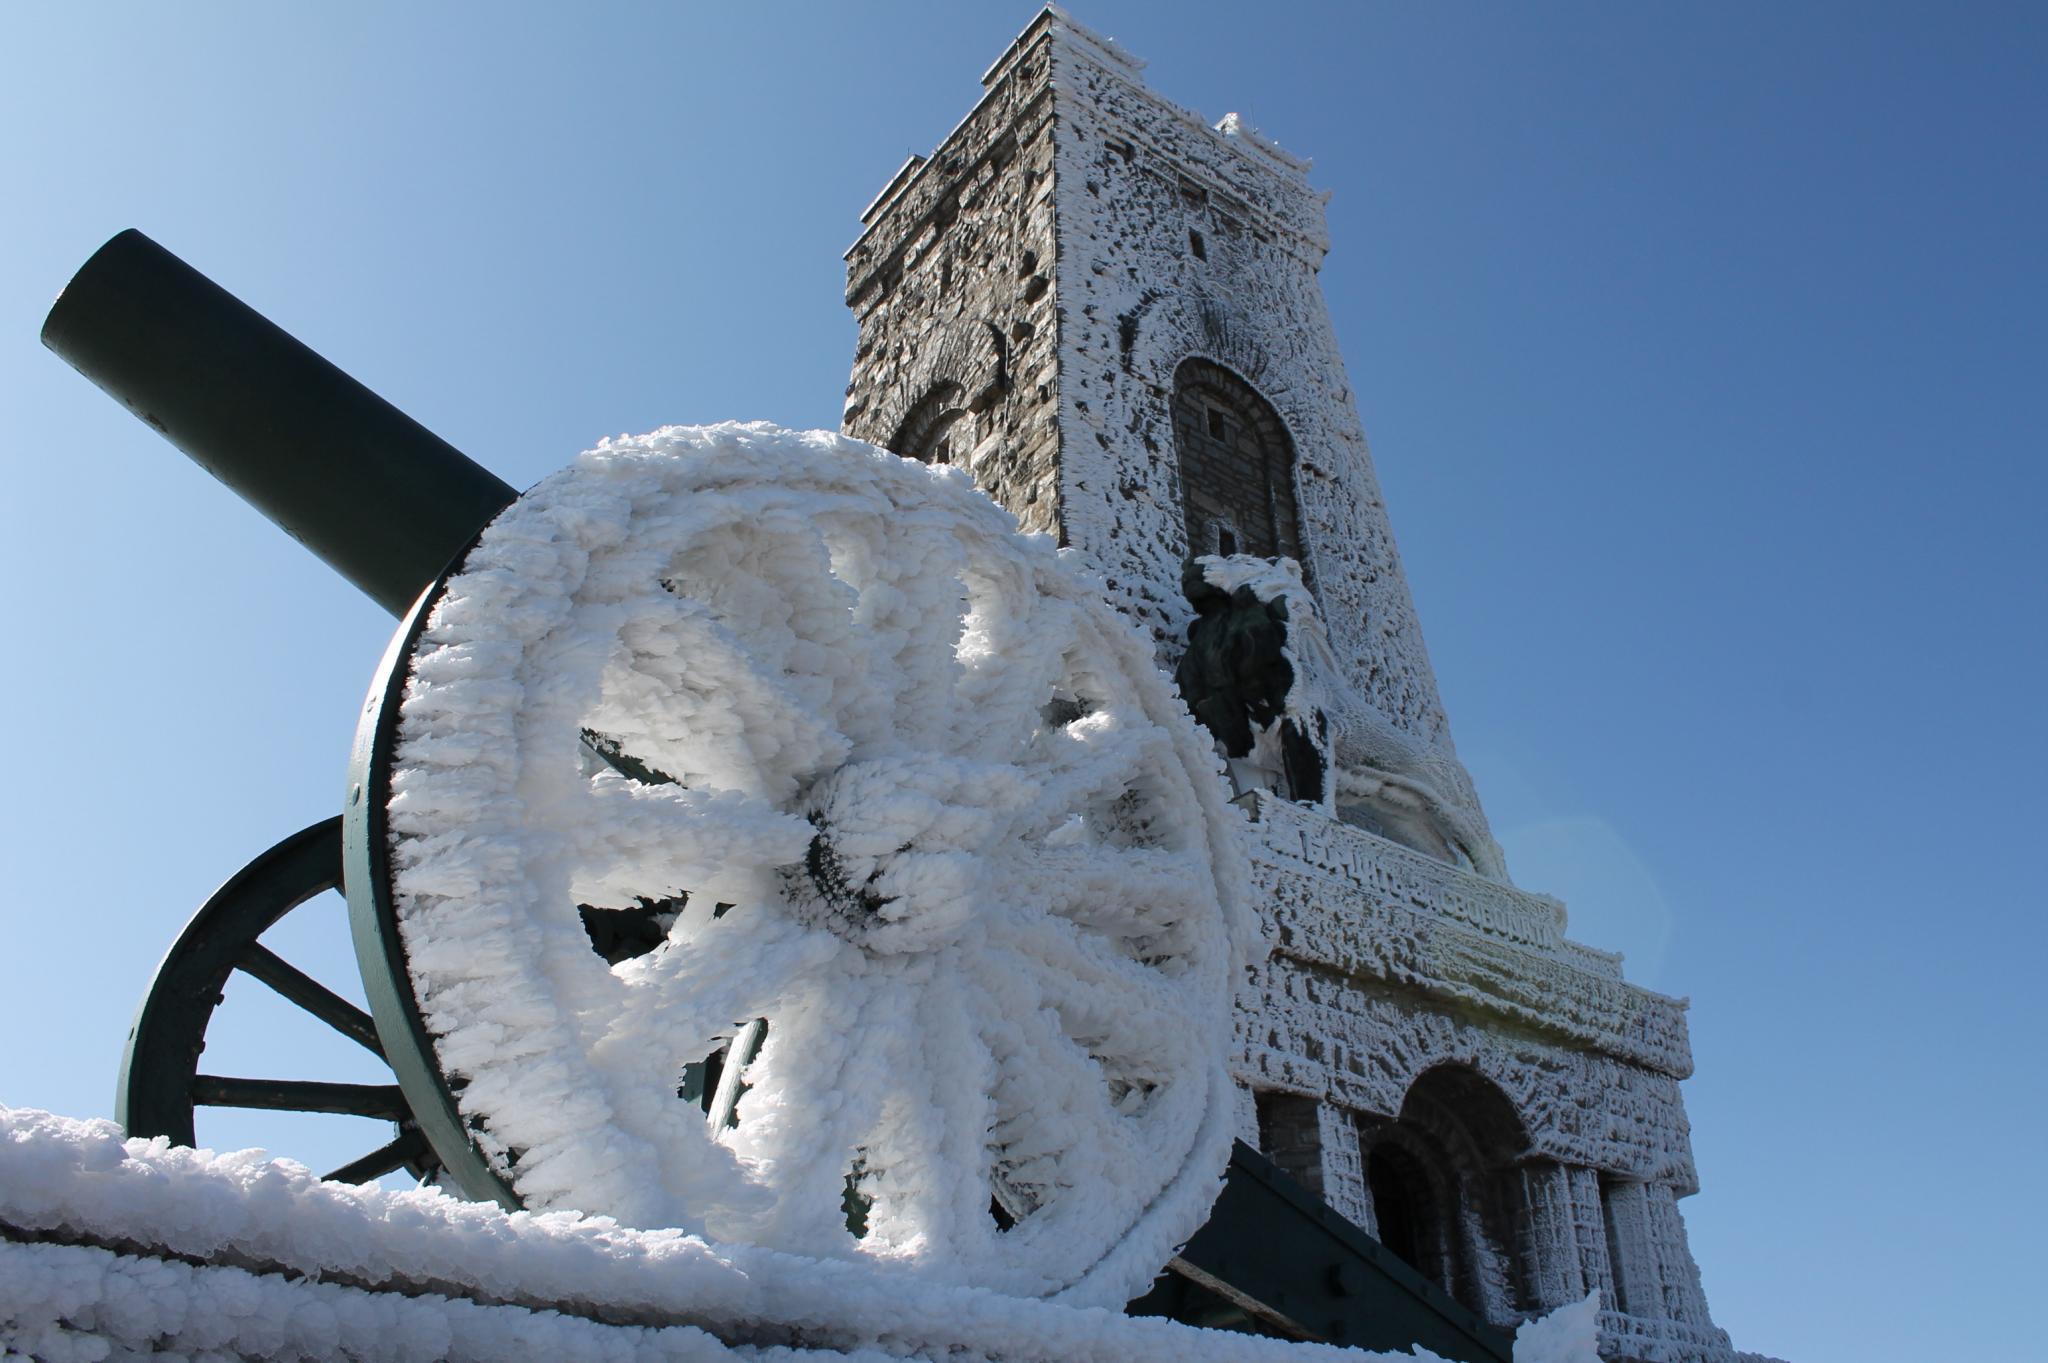 Паметник на свободата, Шипка. Източник: Община Габрово